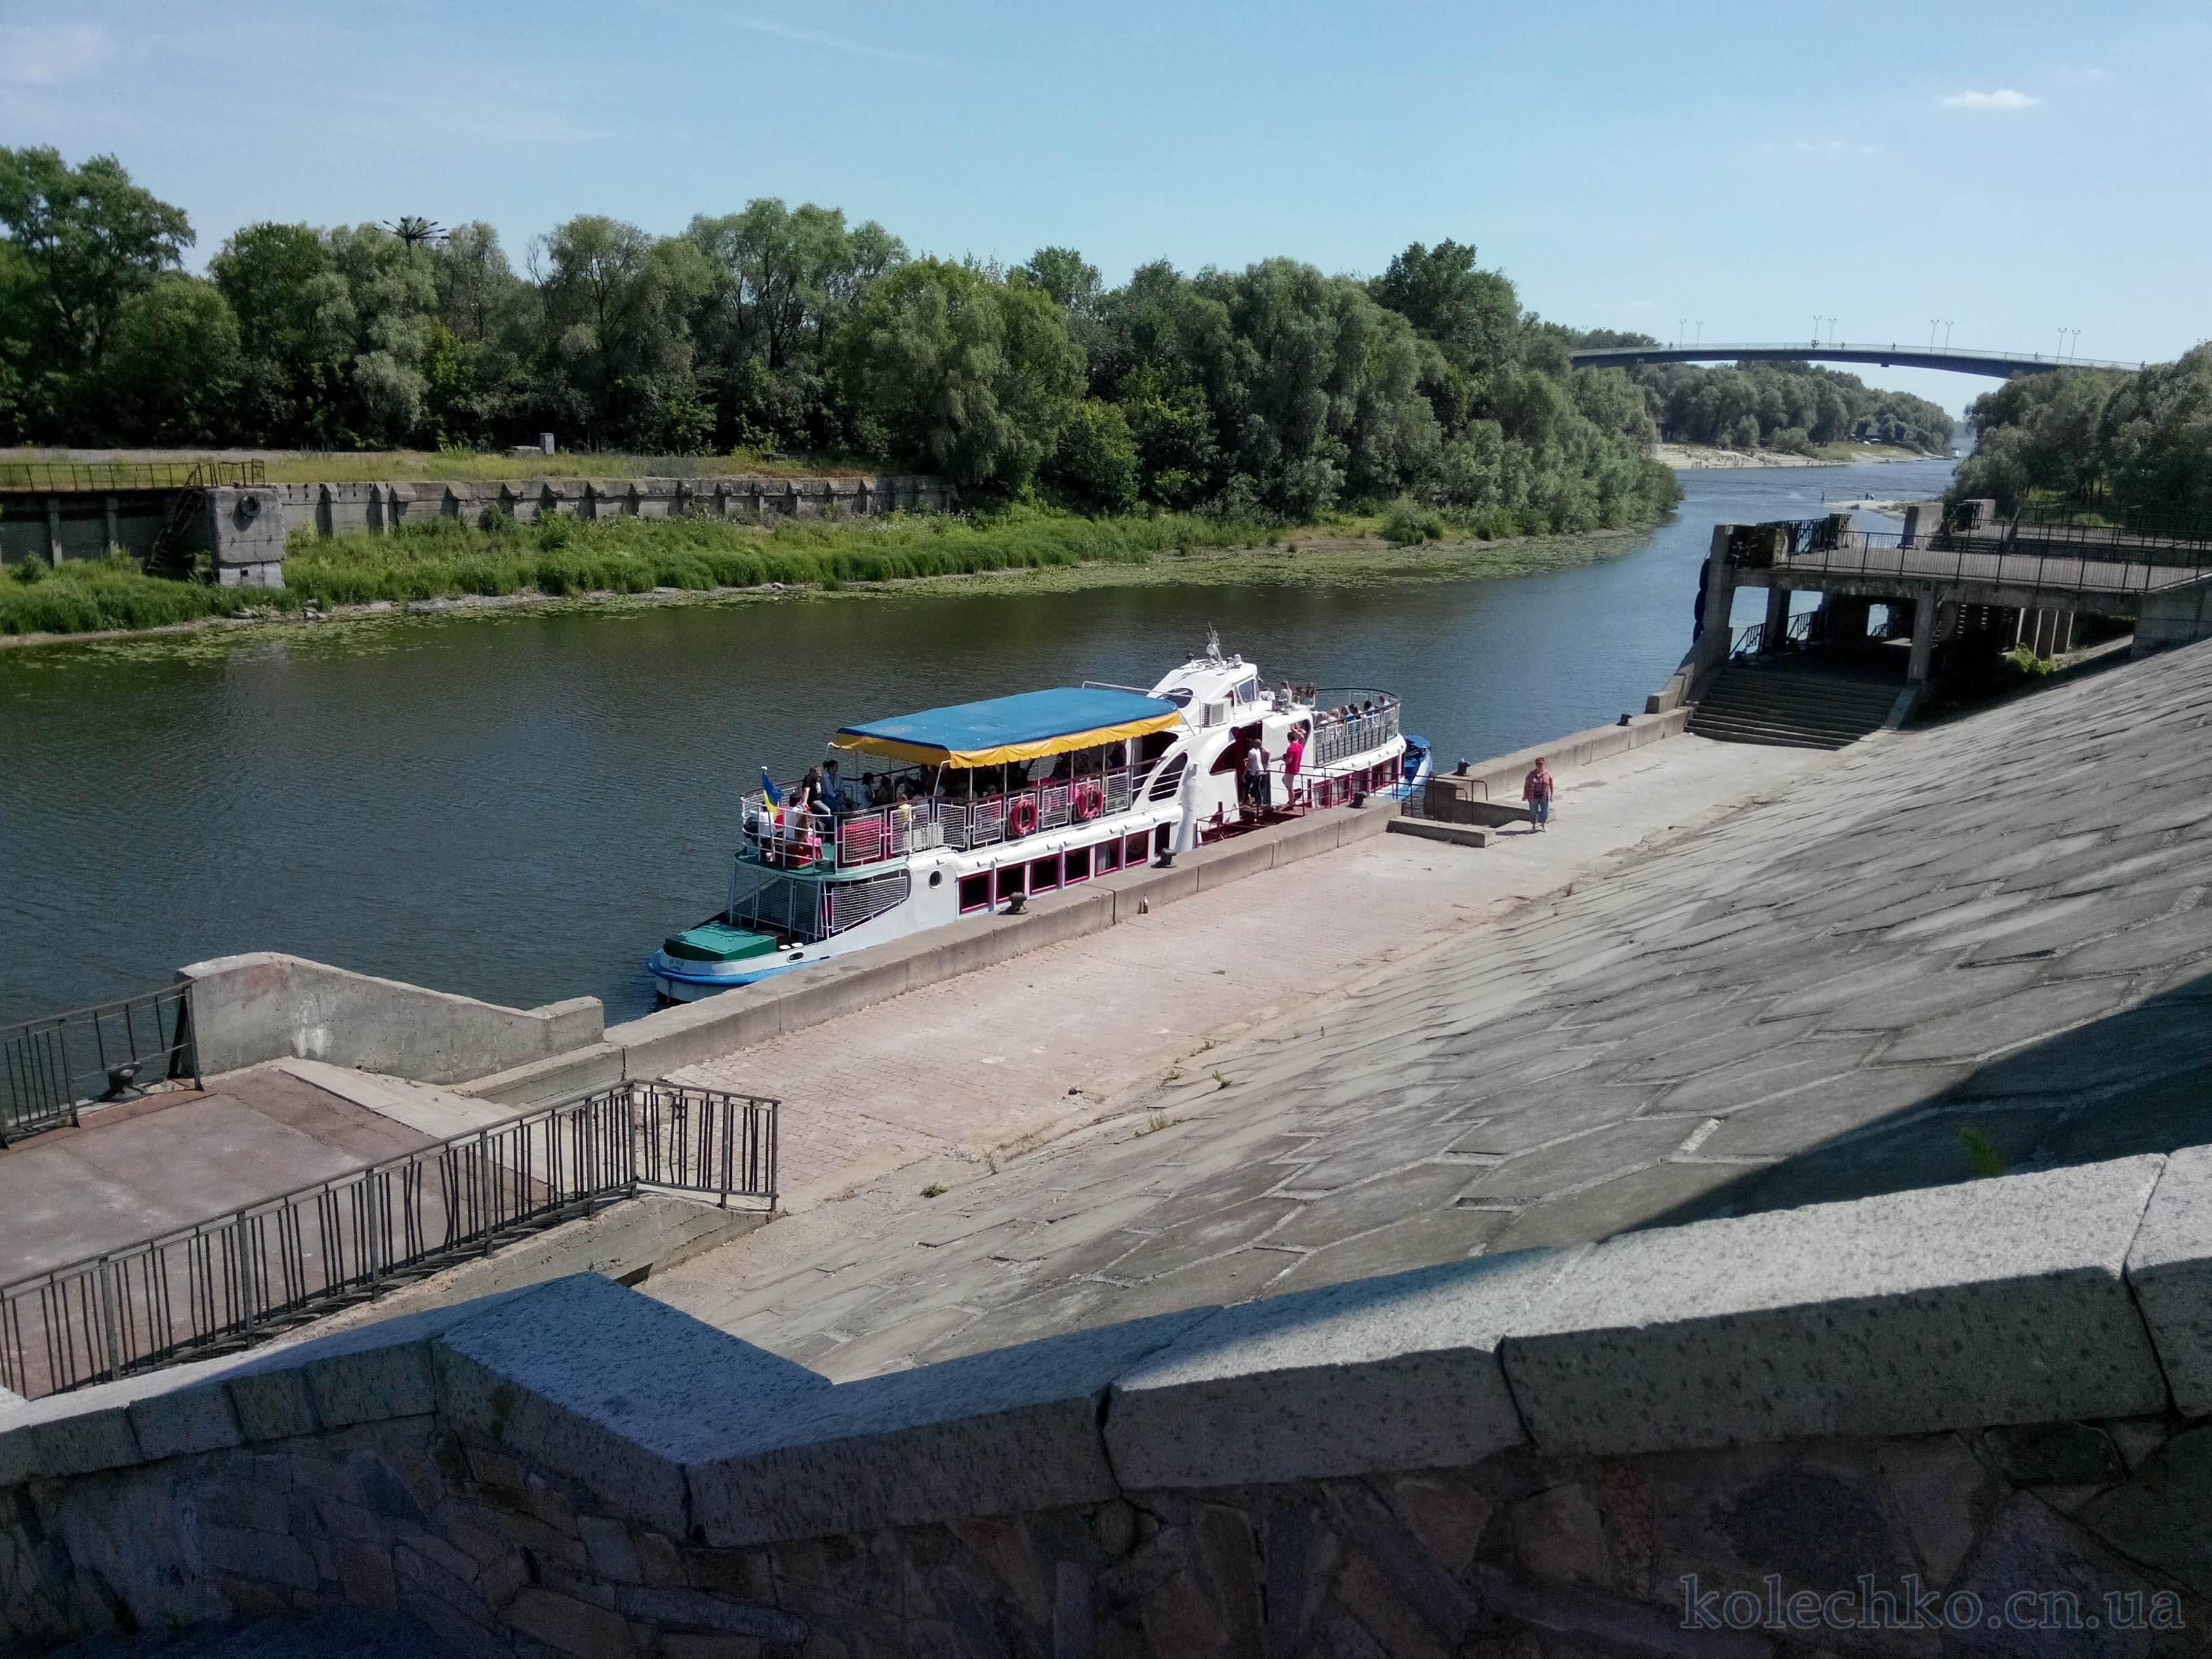 Прогулка на теплоходе с речпорта Чернигова